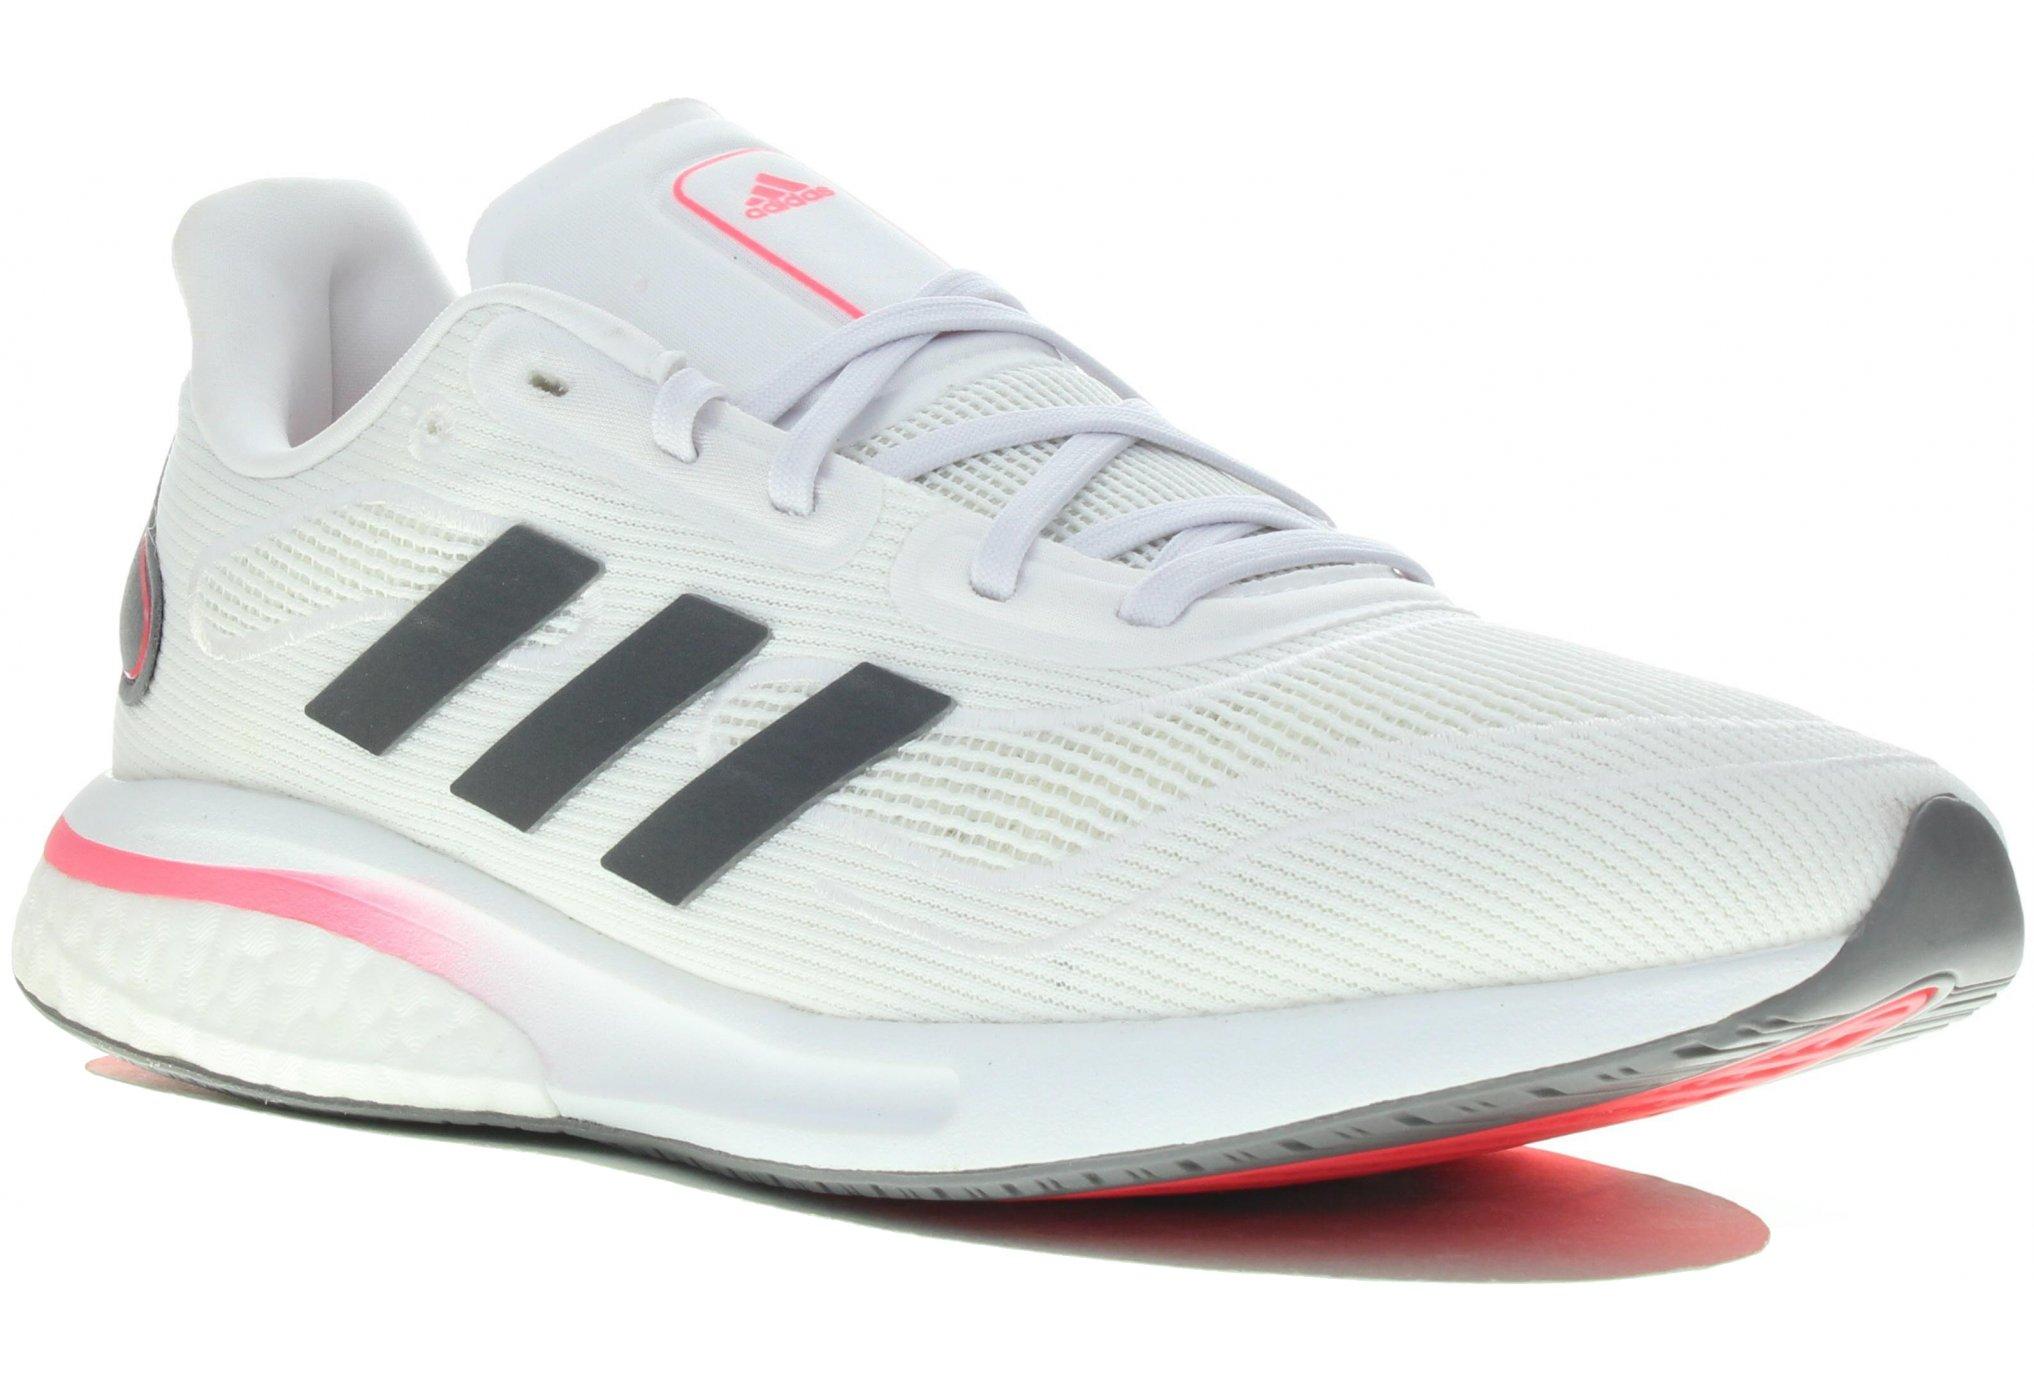 adidas Supernova W Chaussures running femme